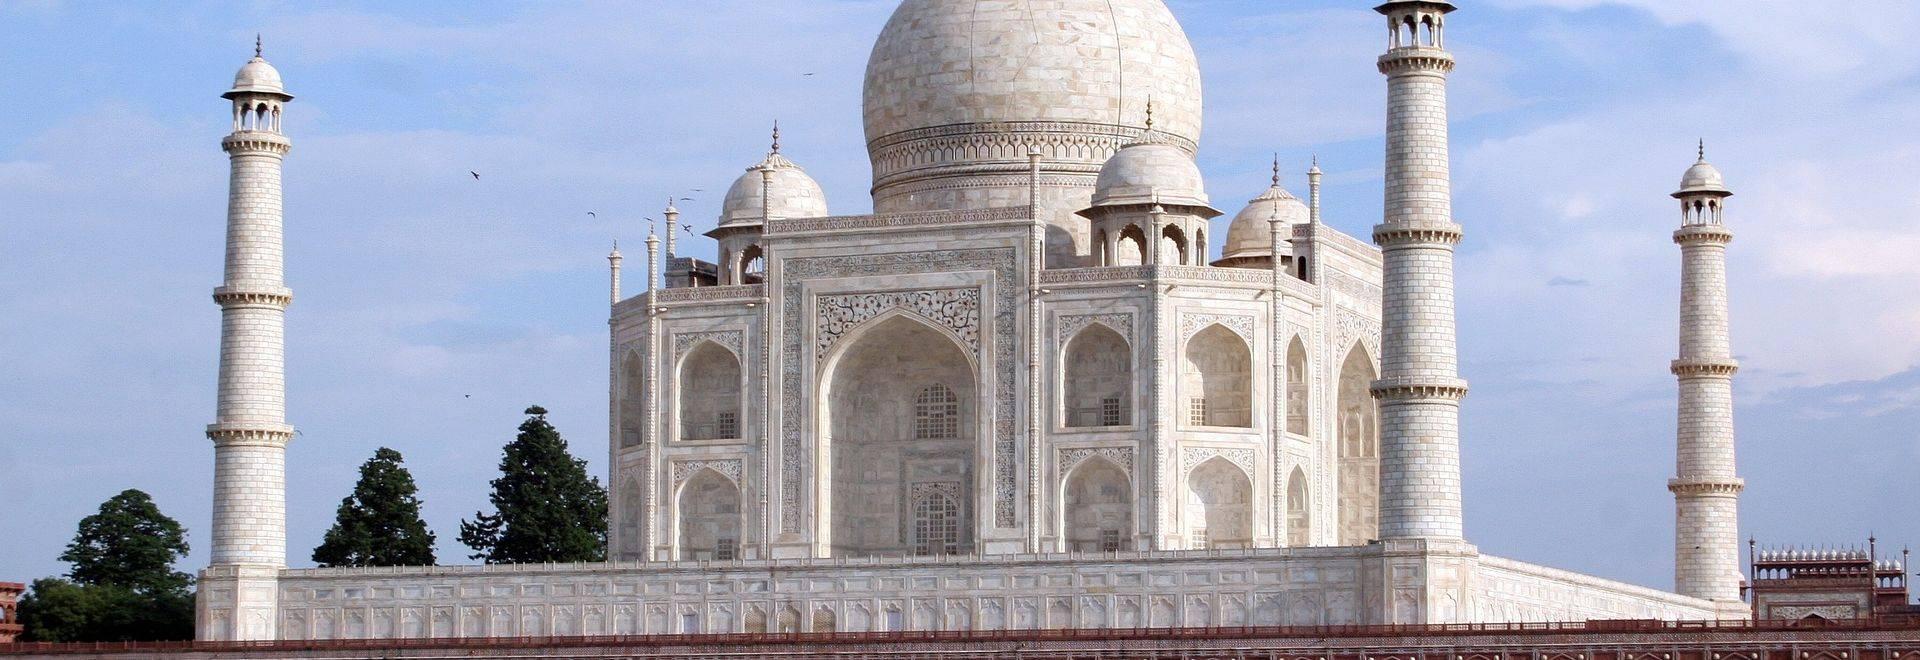 India Scenic Taj Mahal